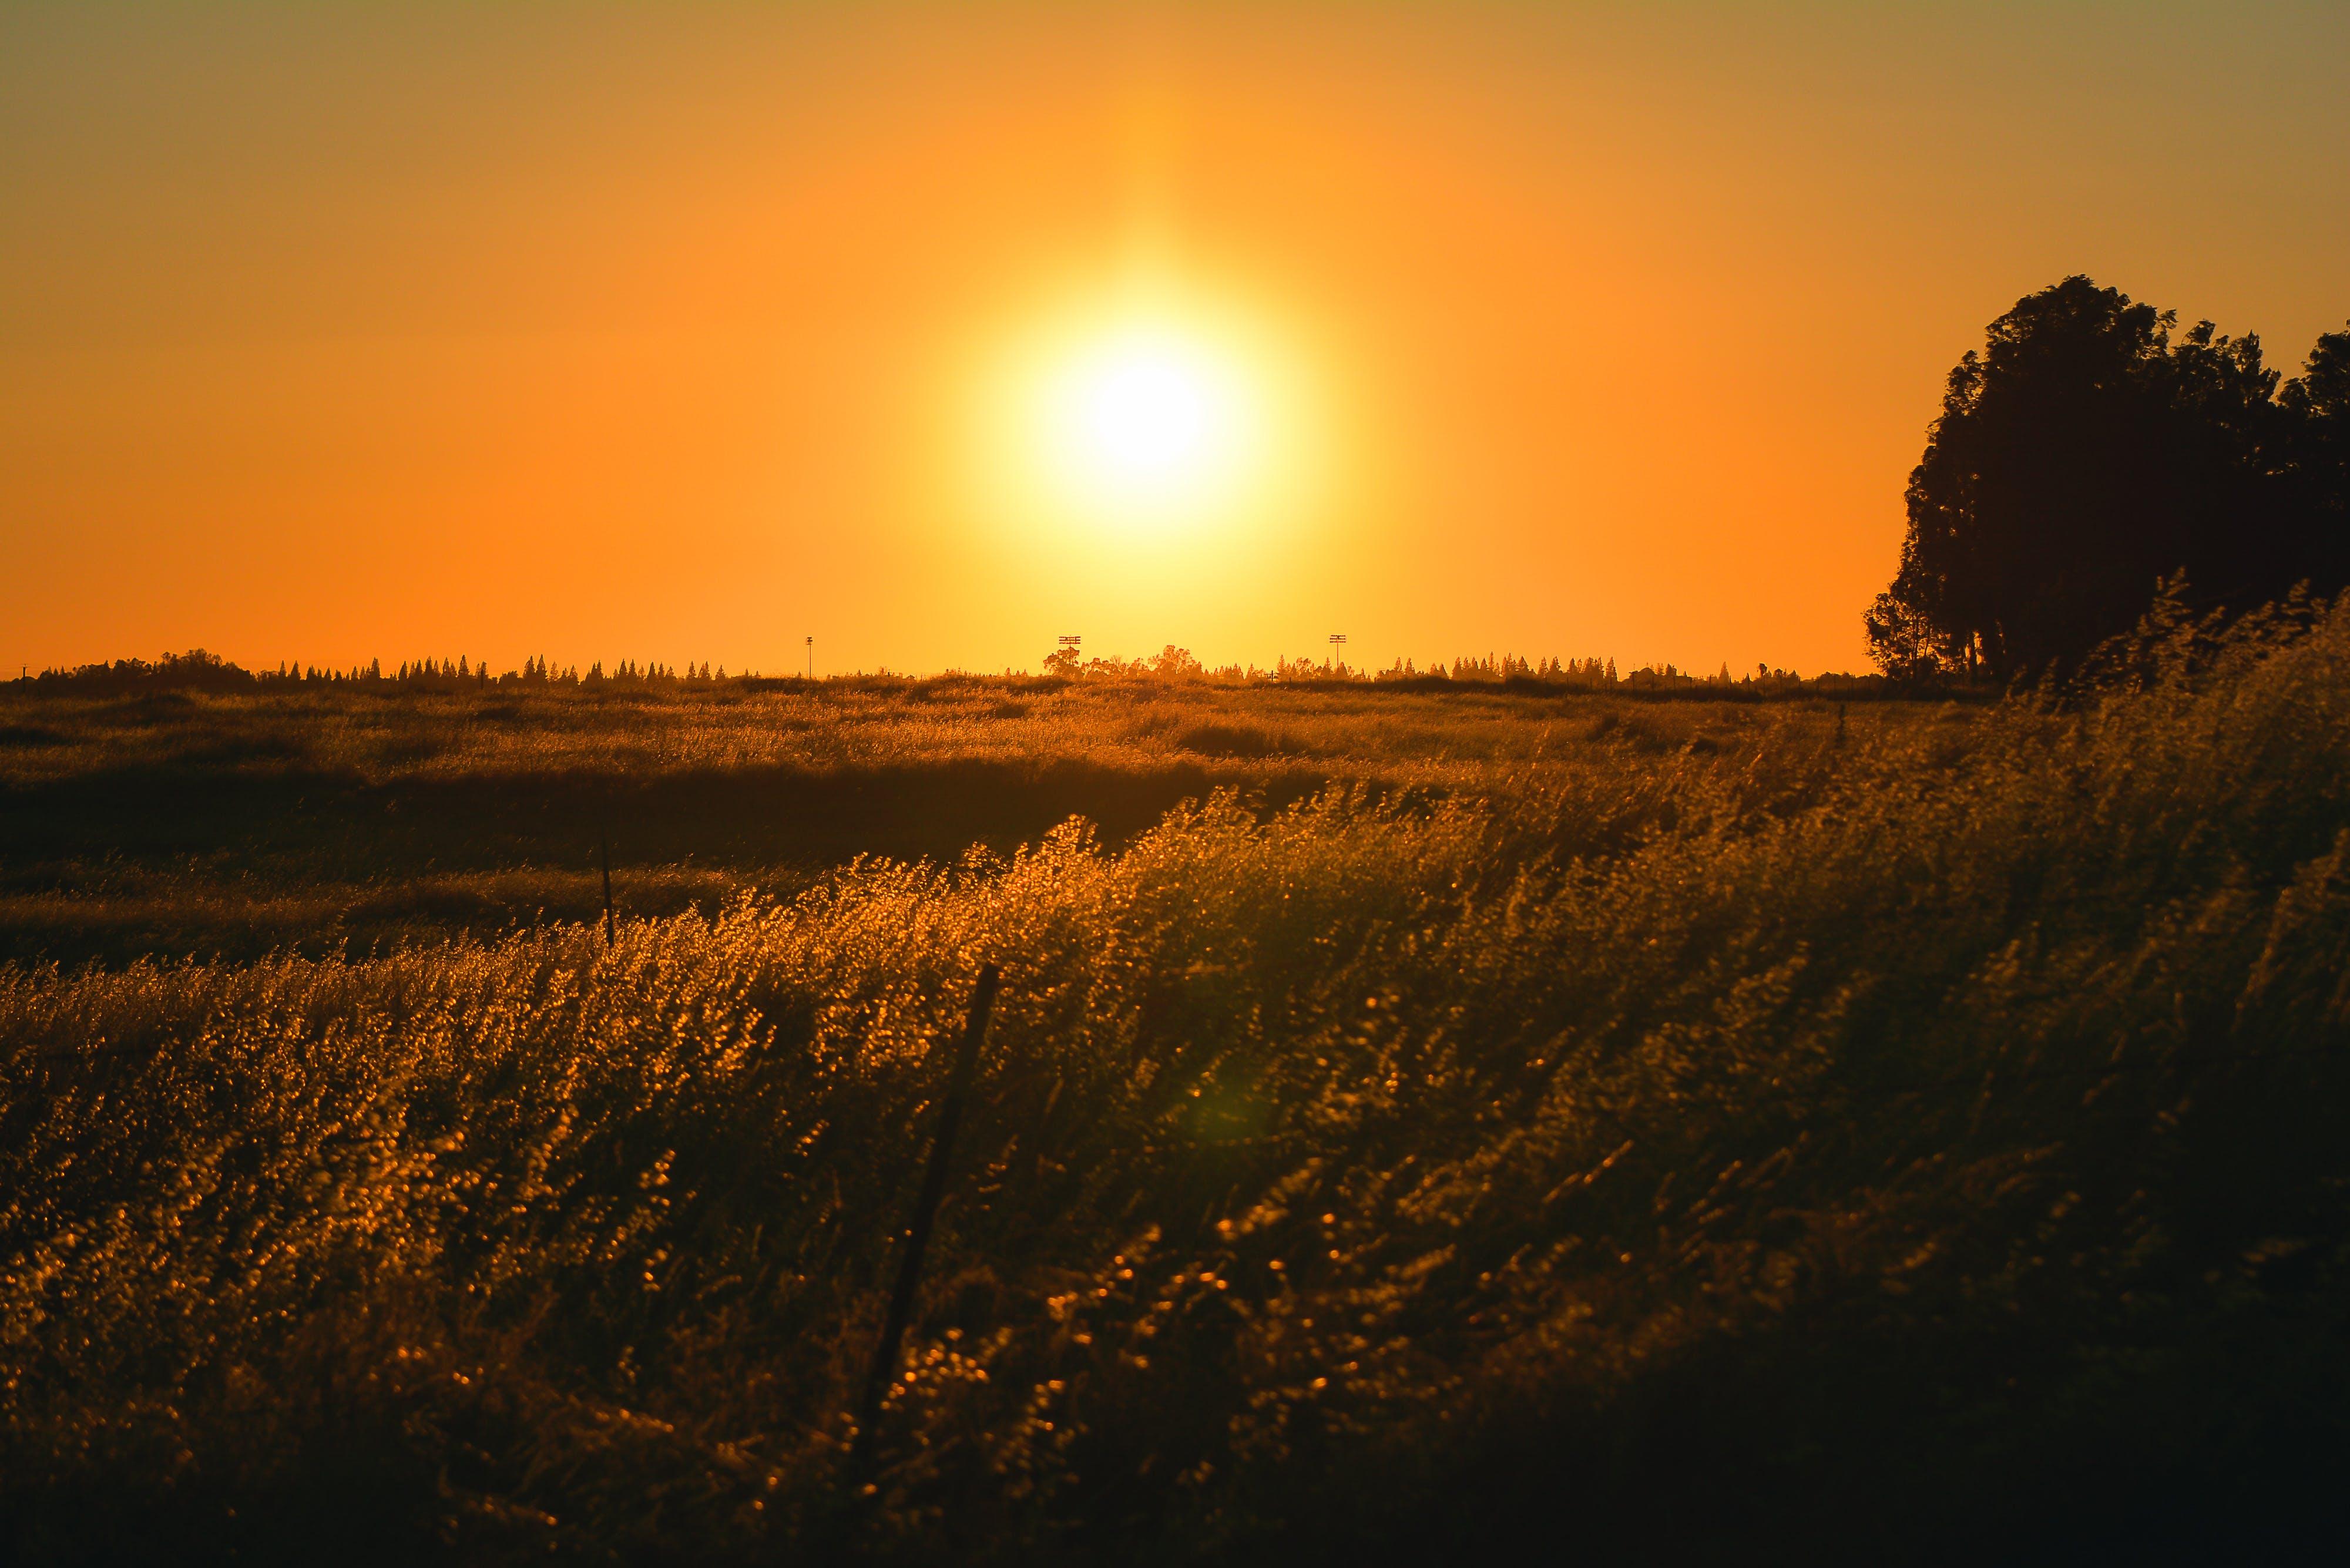 Kostenloses Stock Foto zu dämmerung, draußen, feld, goldenen sonnenuntergang